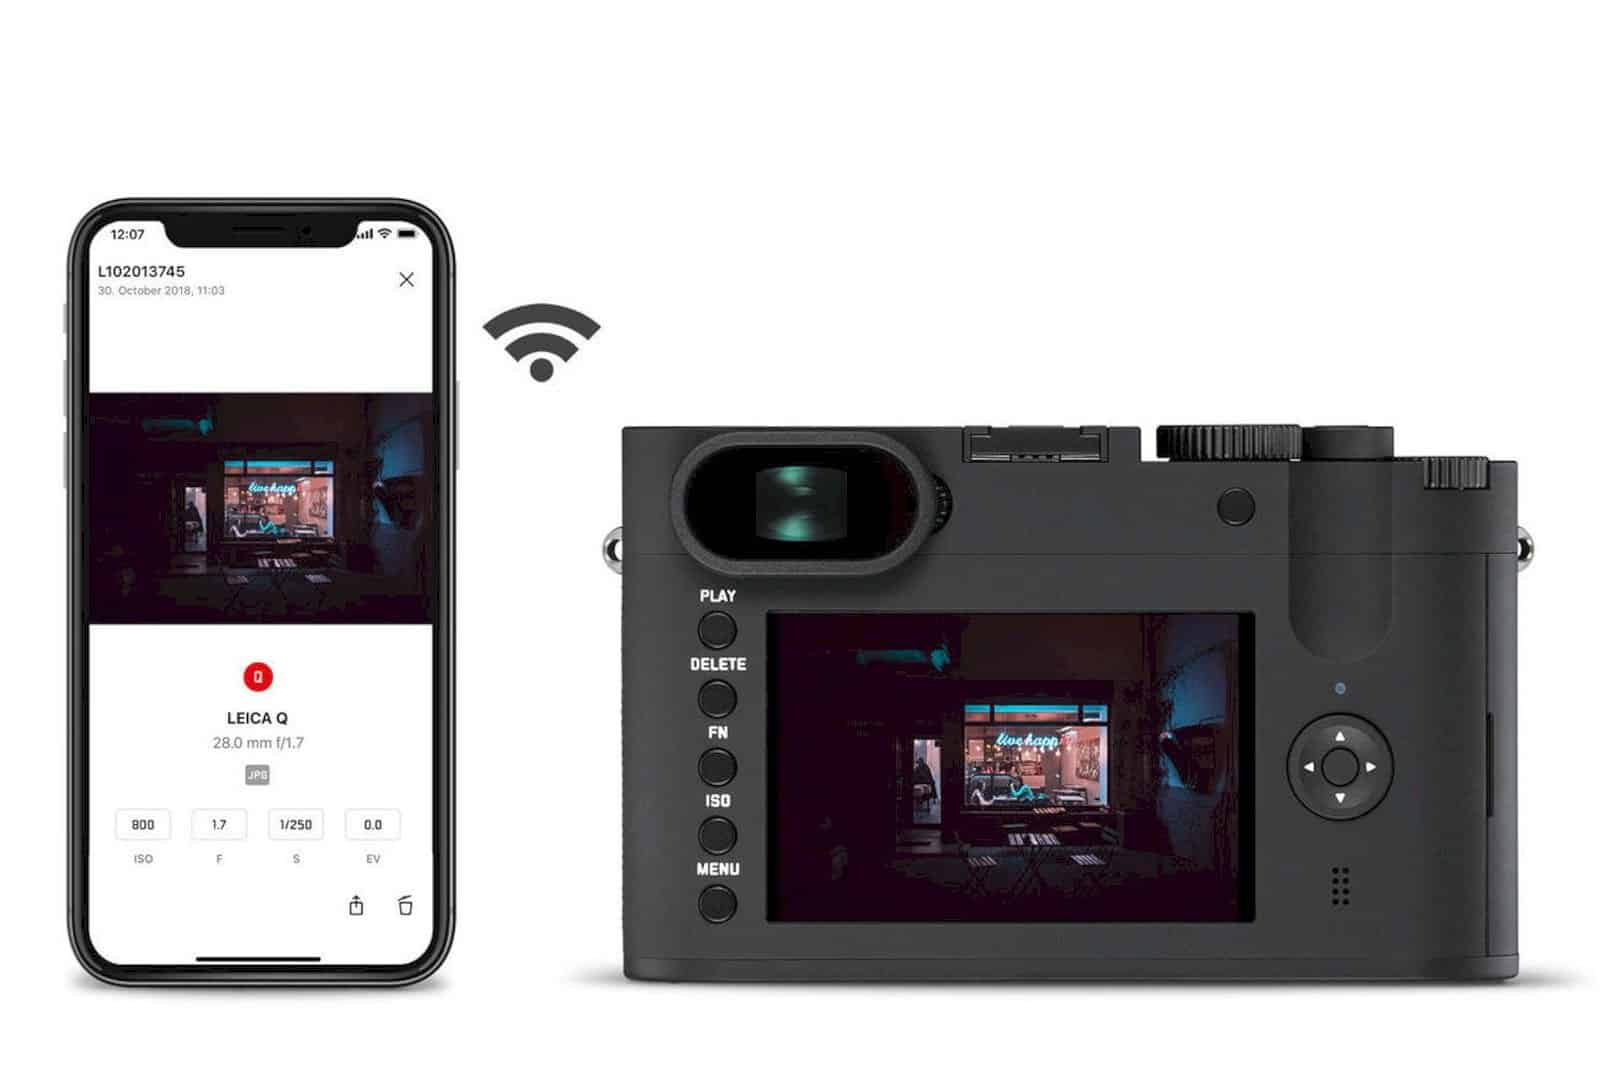 Leica Q P 2